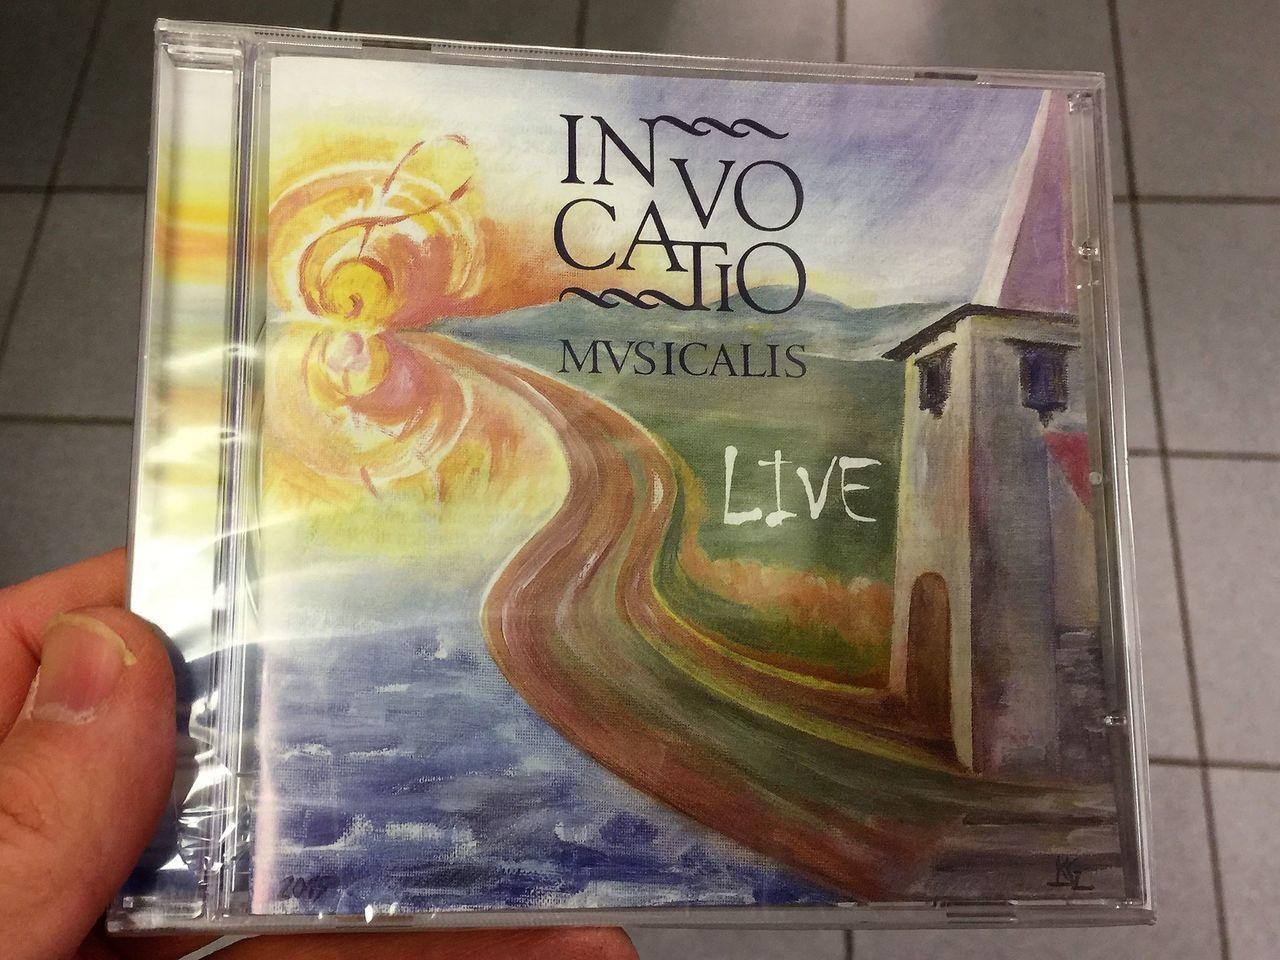 invocatio-musicalis-live-kollr-attila-solaris-hungarian-cd-2015-bgcd-226-1-87646.1550686571.1280.1280.jpg